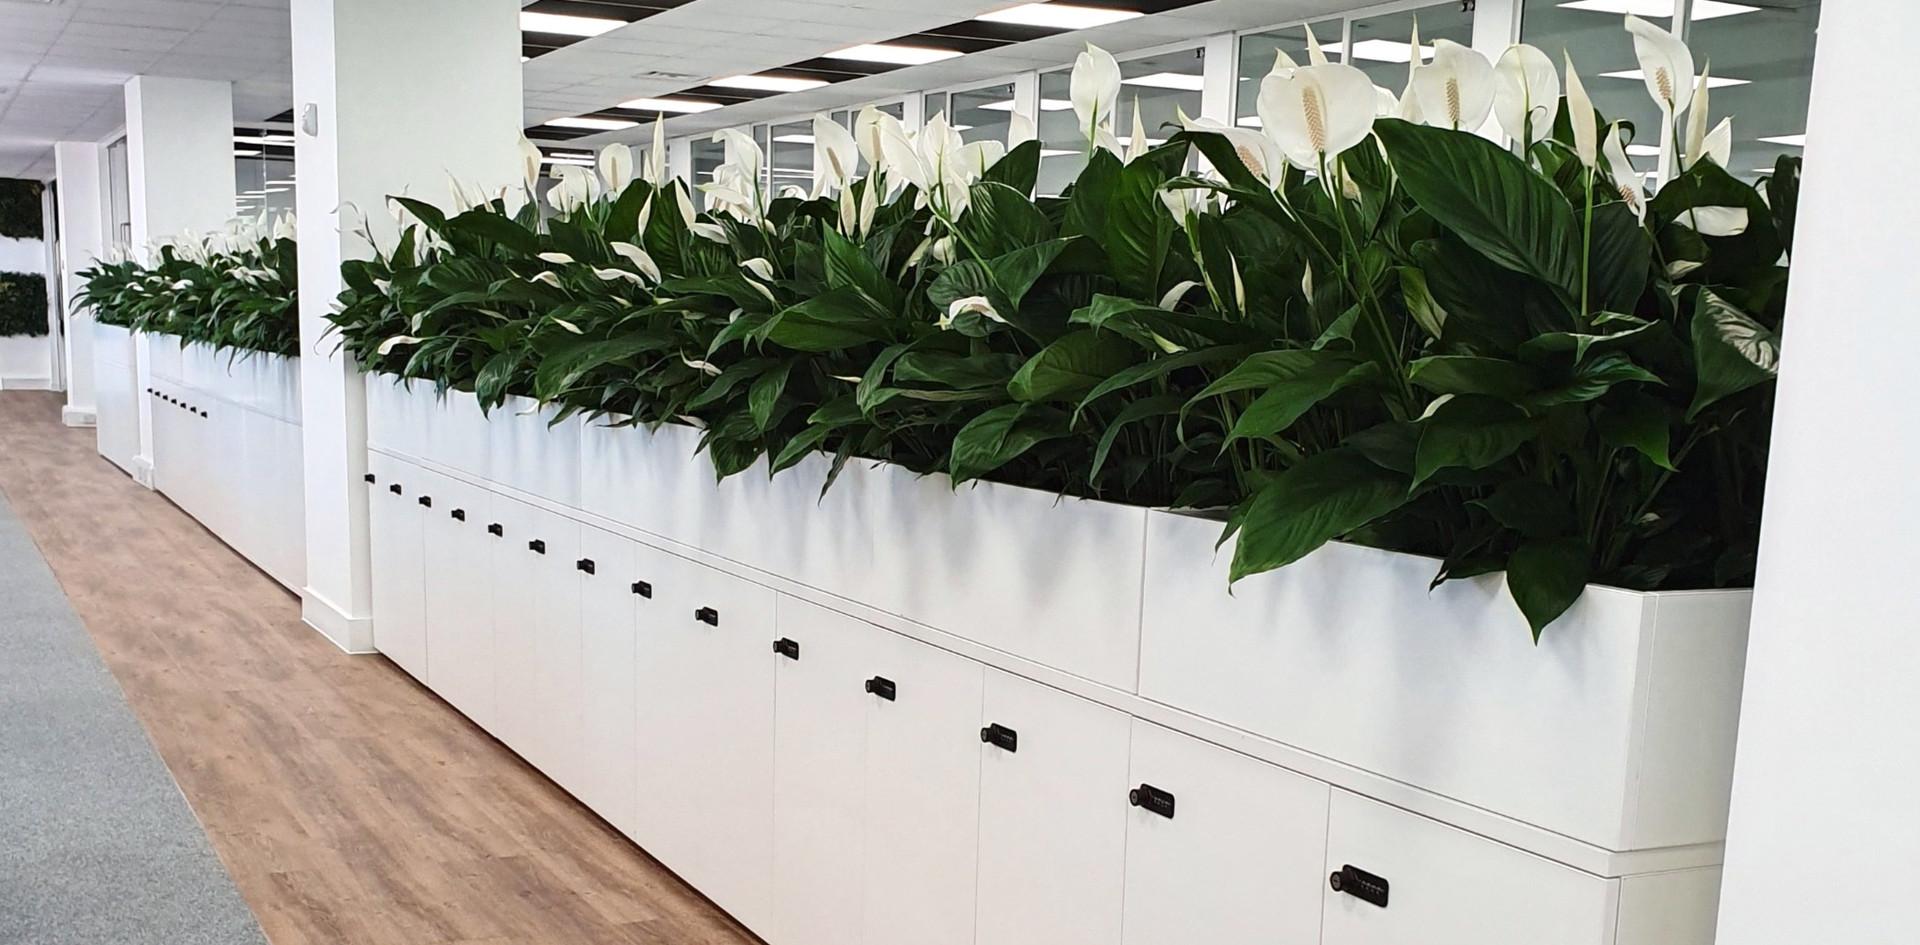 agile worksplace hot desking locker combination lock planters